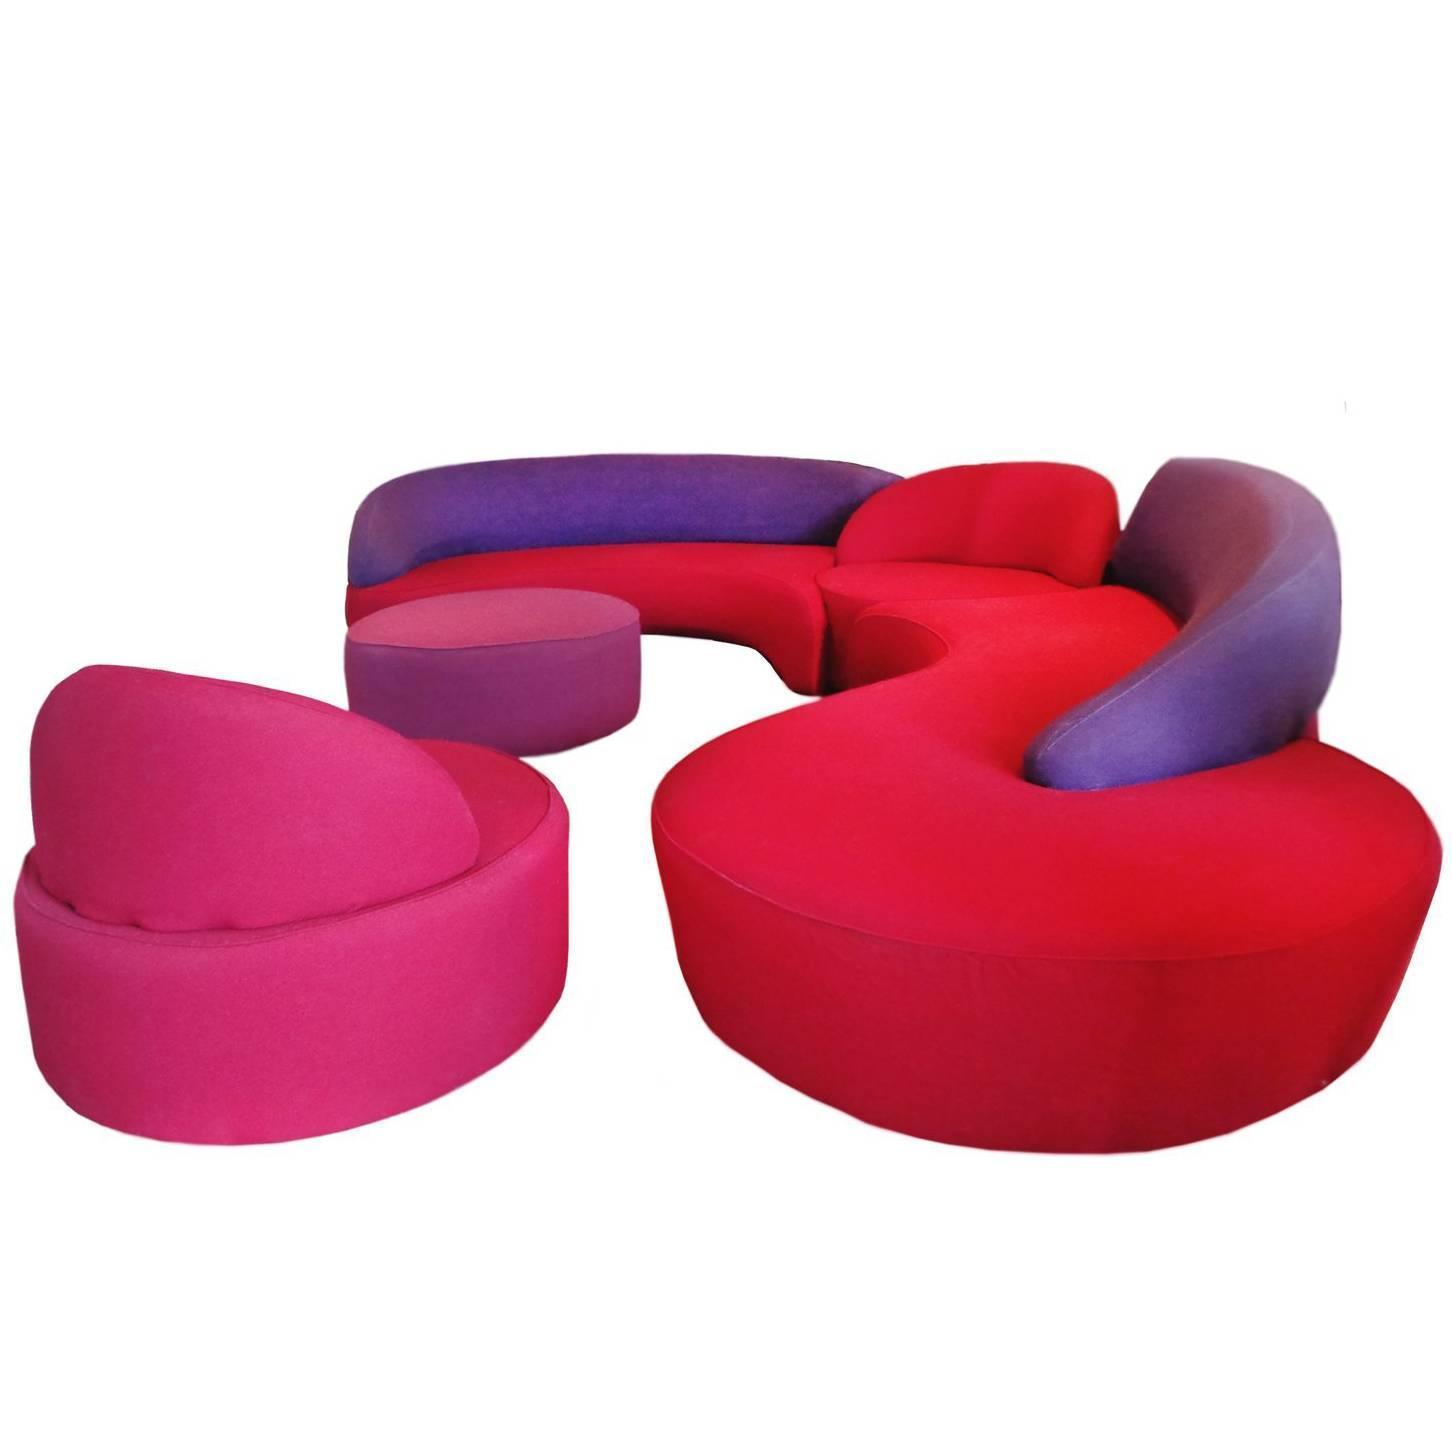 roche bobois catalogue simple roche bobois high end furniture meets textiles with roche bobois. Black Bedroom Furniture Sets. Home Design Ideas